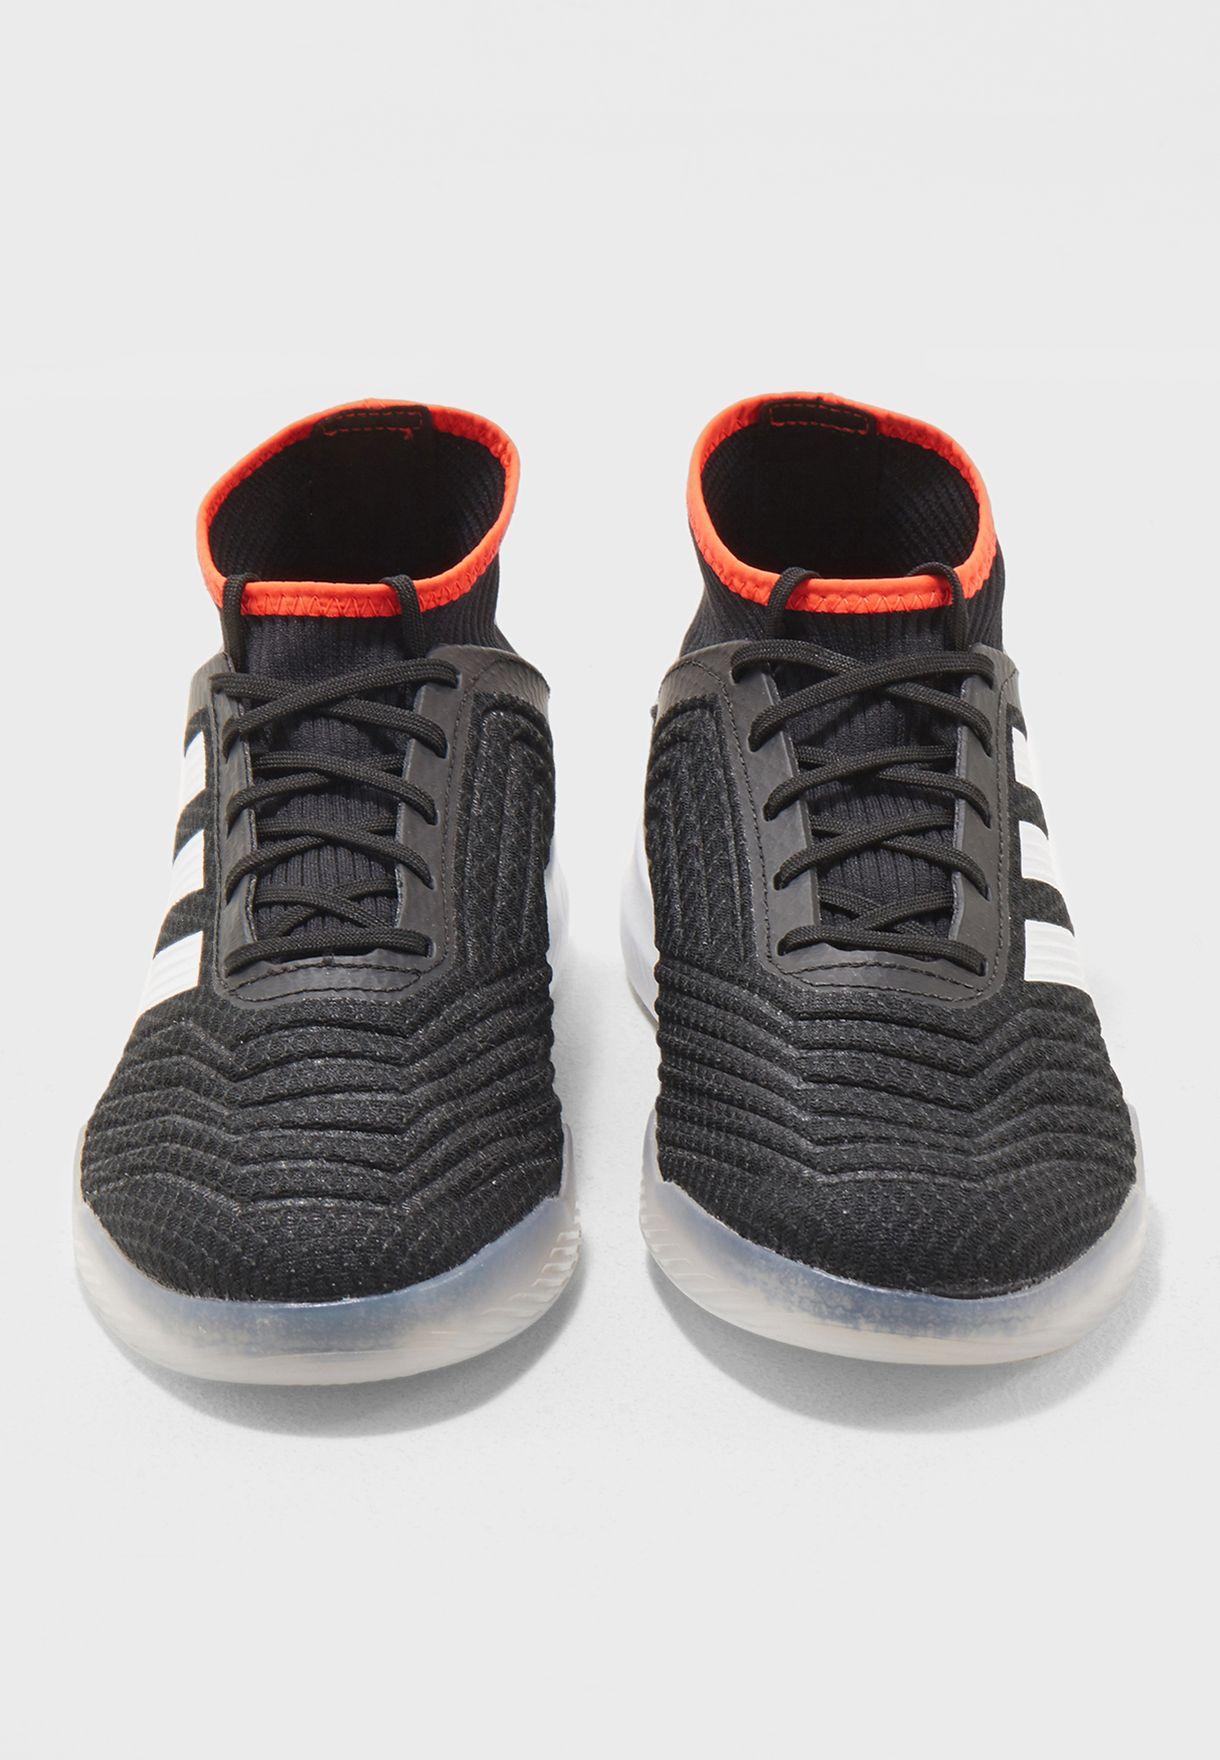 حذاء بريداتور تانغو 18.3 تي اف